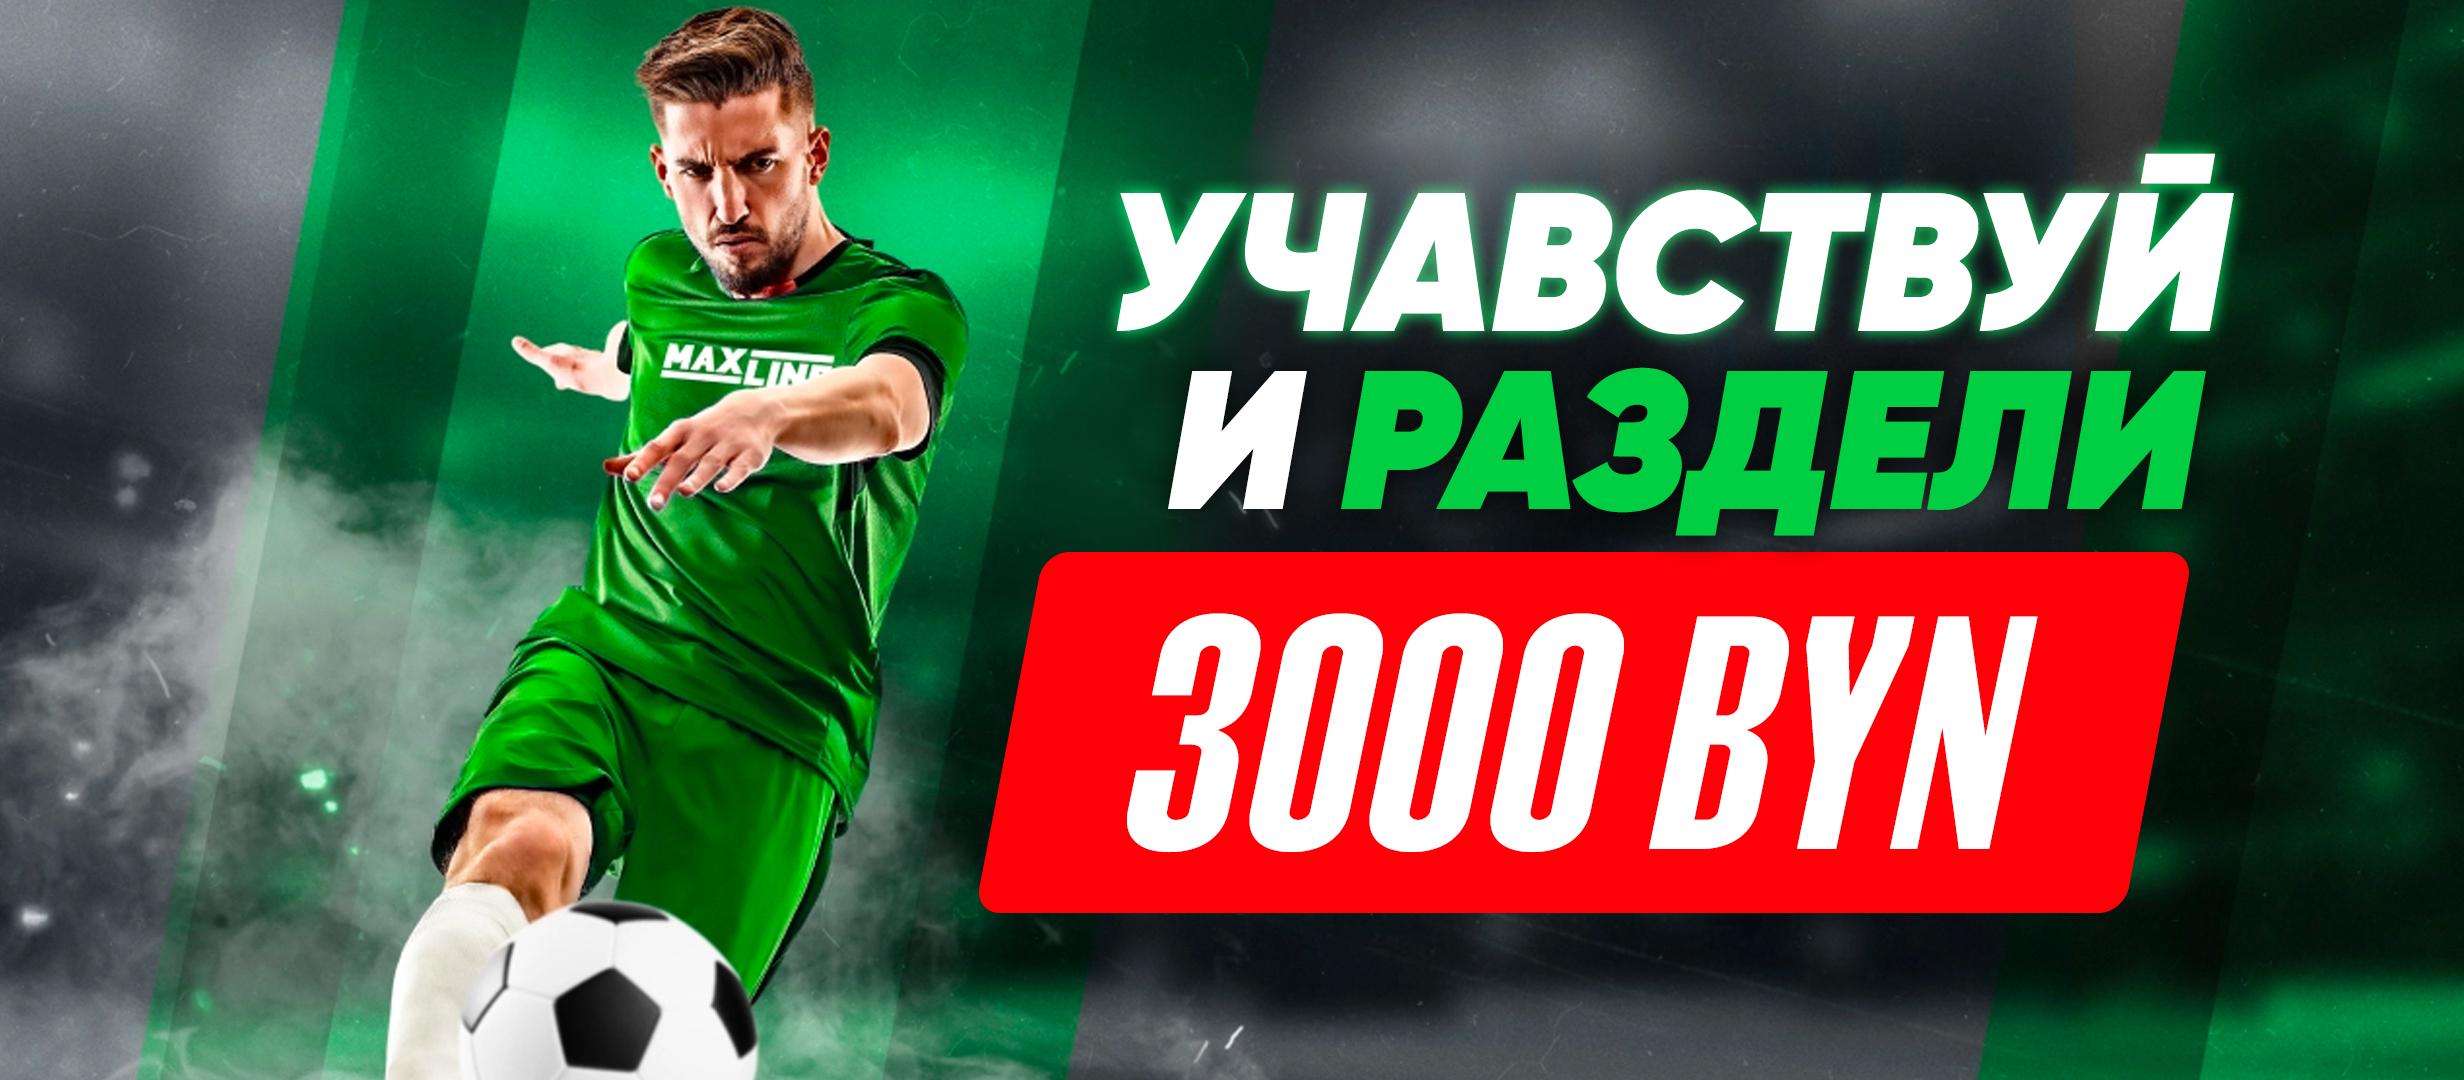 Кеш-бонус от Maxline 700 руб..